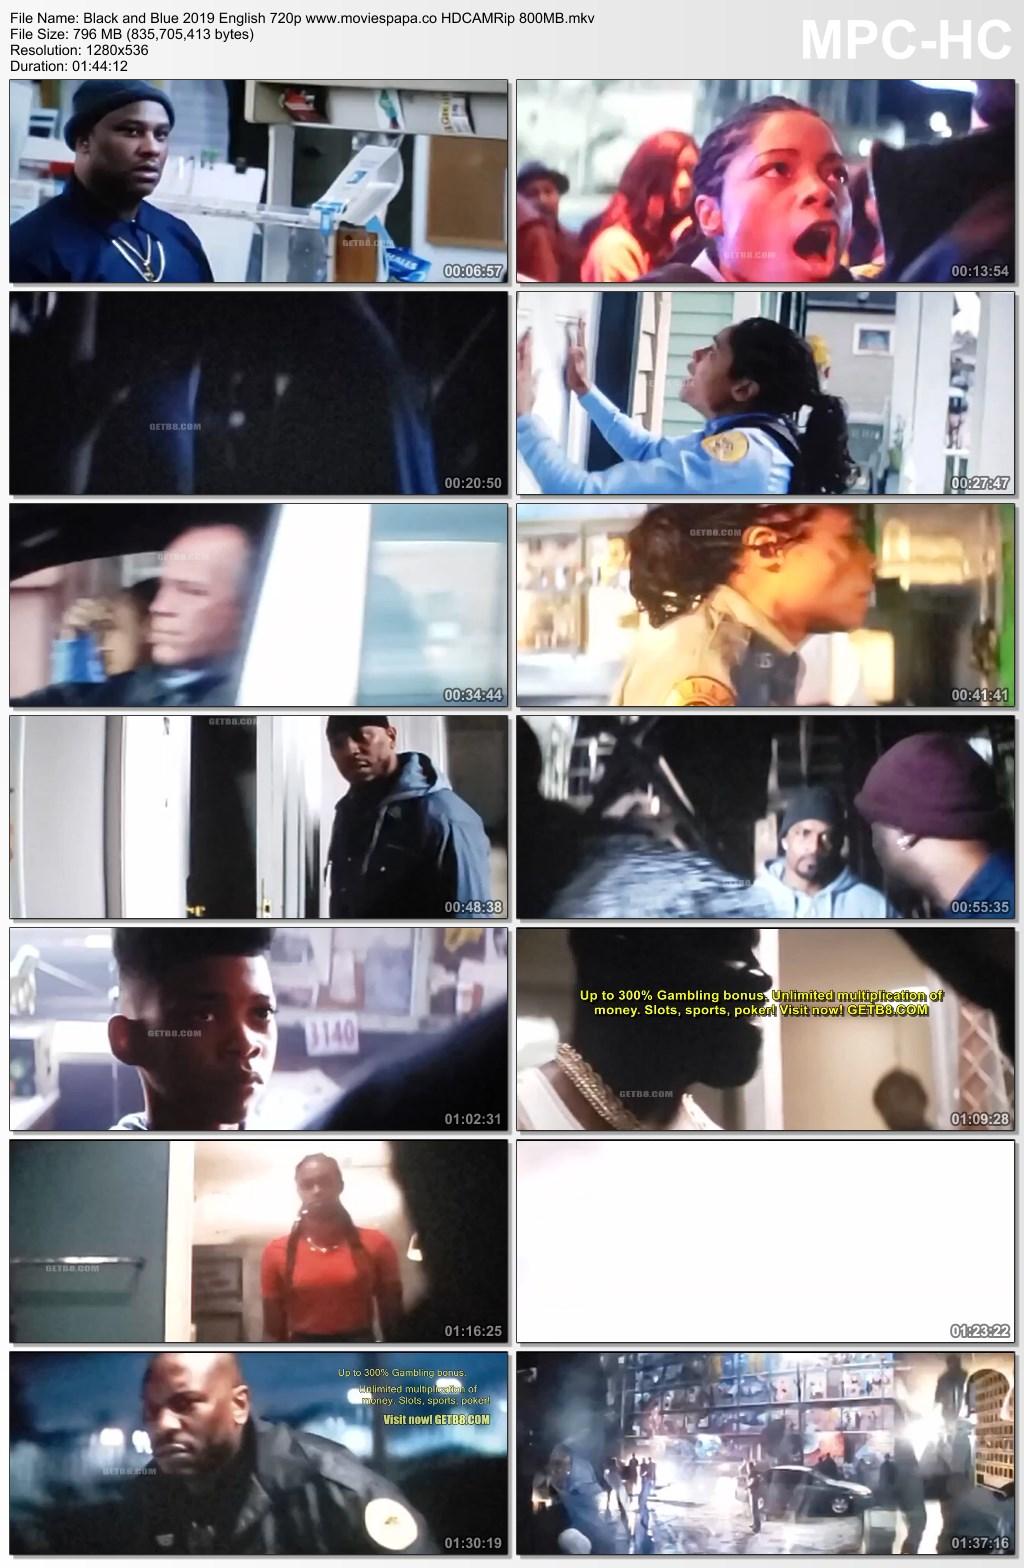 Black and Blue 2019 English Full Movie 720p HDCAMRip 800MB ...